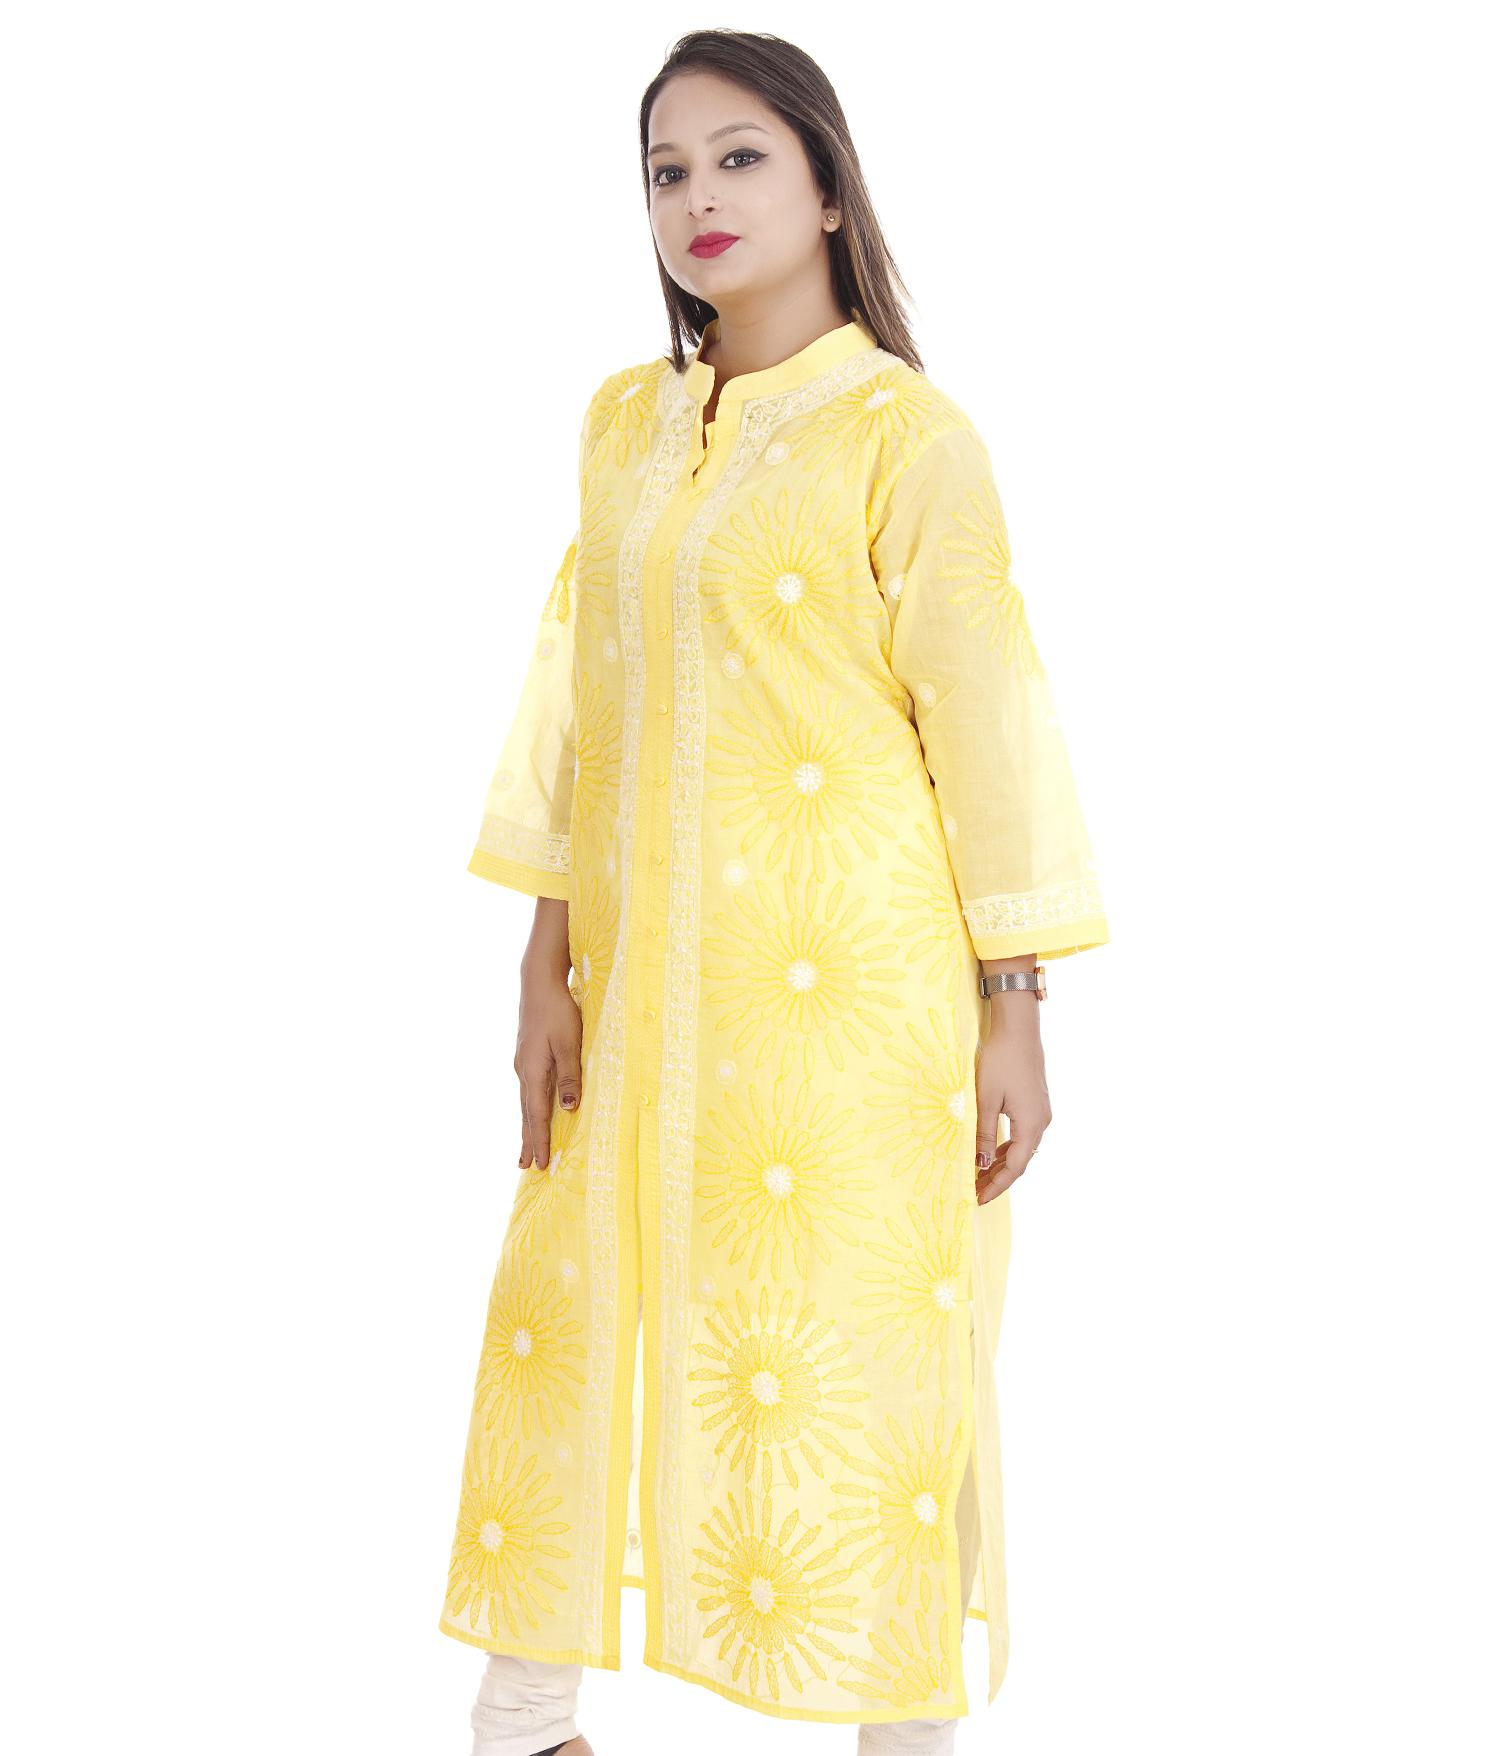 Ethnava Hand Embroidered Terry-voile cotton Lucknowi Chikan Front Slit Kurta